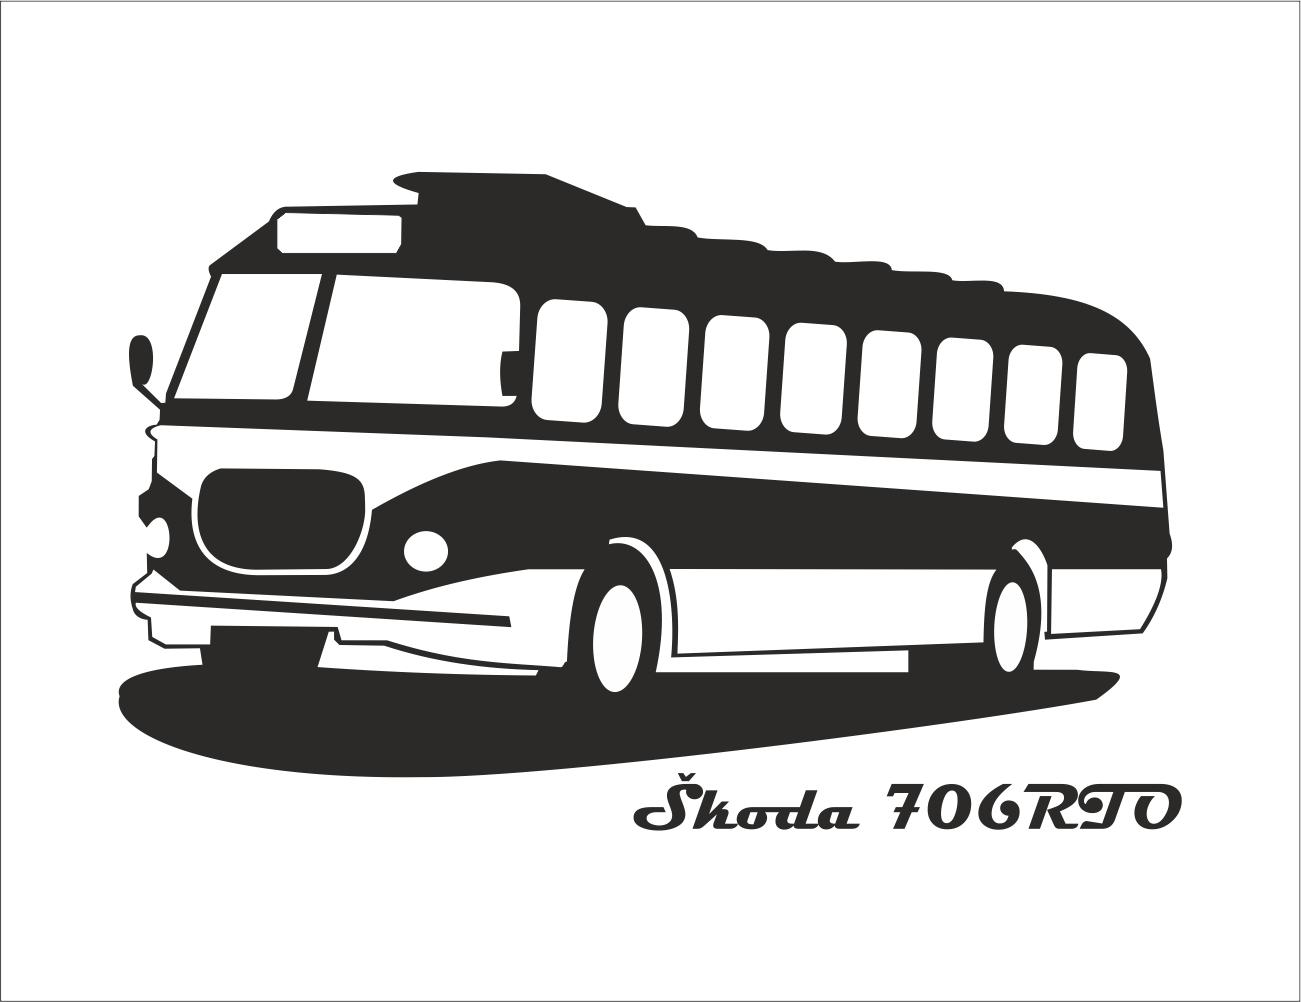 7a_autobus_darkove_predmety.jpg